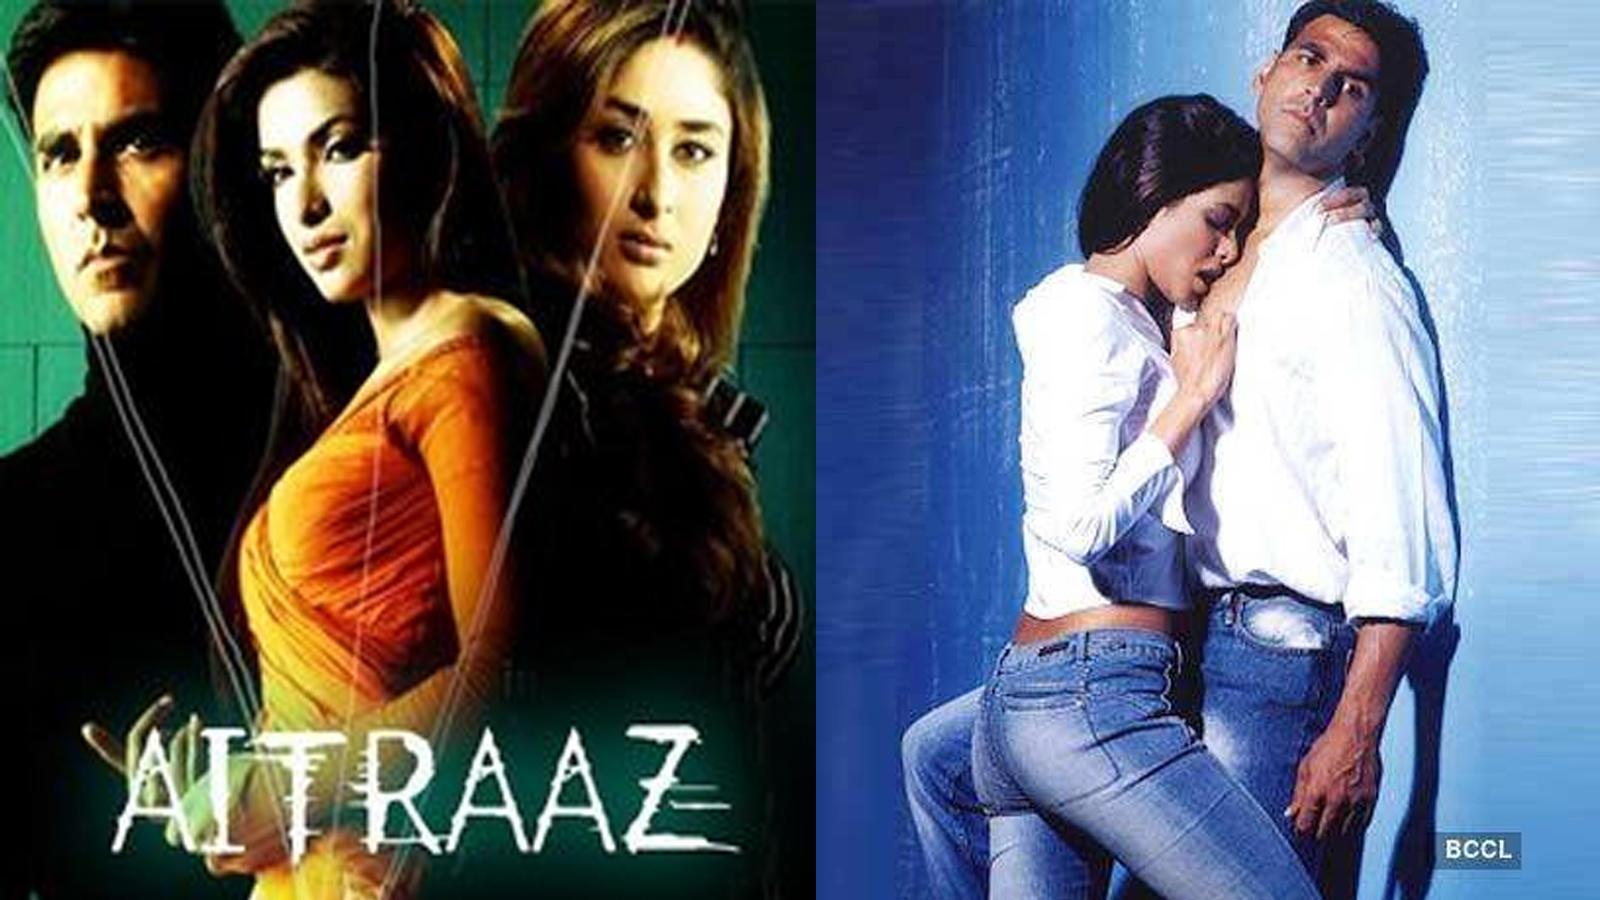 Aitraaz Full Movie Download Moviescounter, Filmywap, FilmyZilla